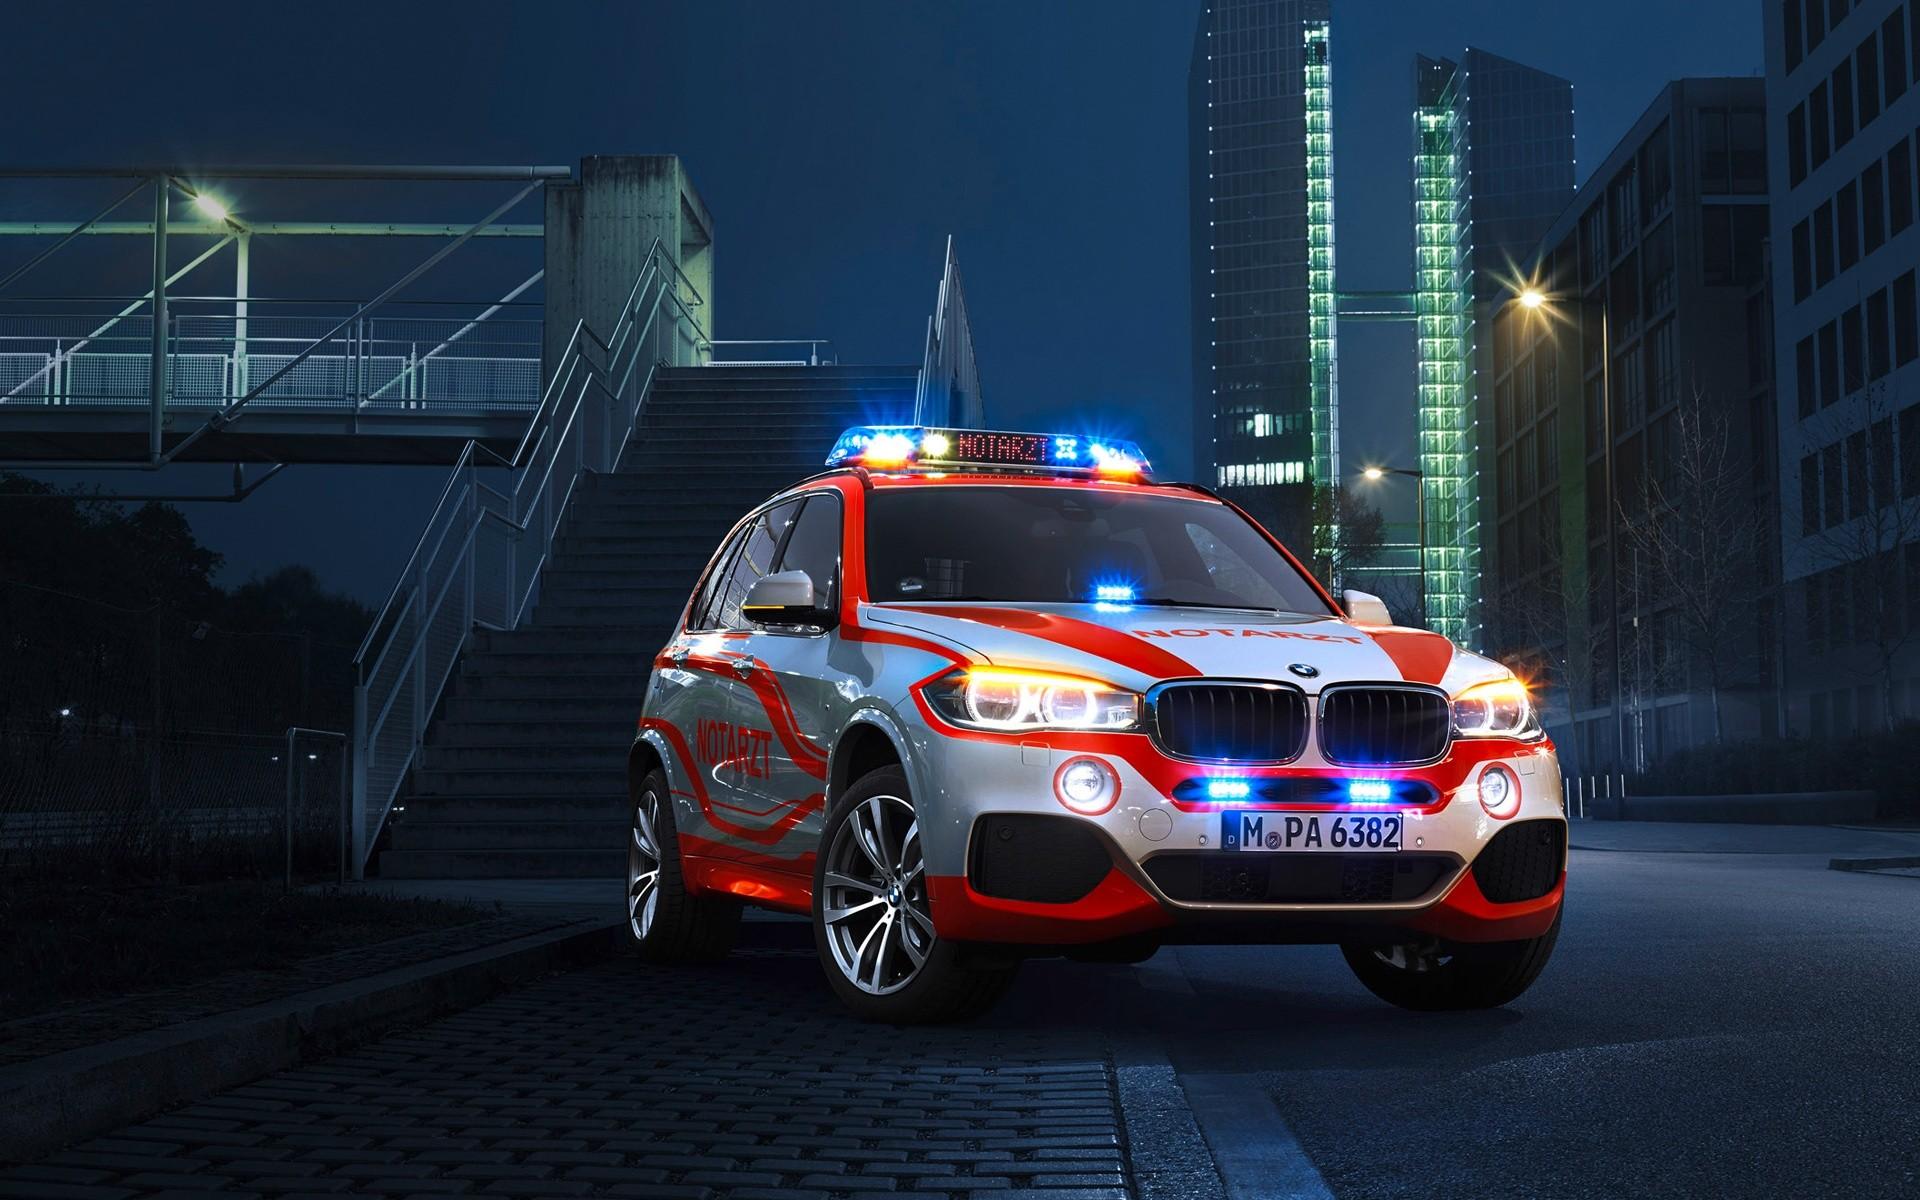 BMW X3 Paramedic Vehicle Wallpaper   HD Car Wallpapers